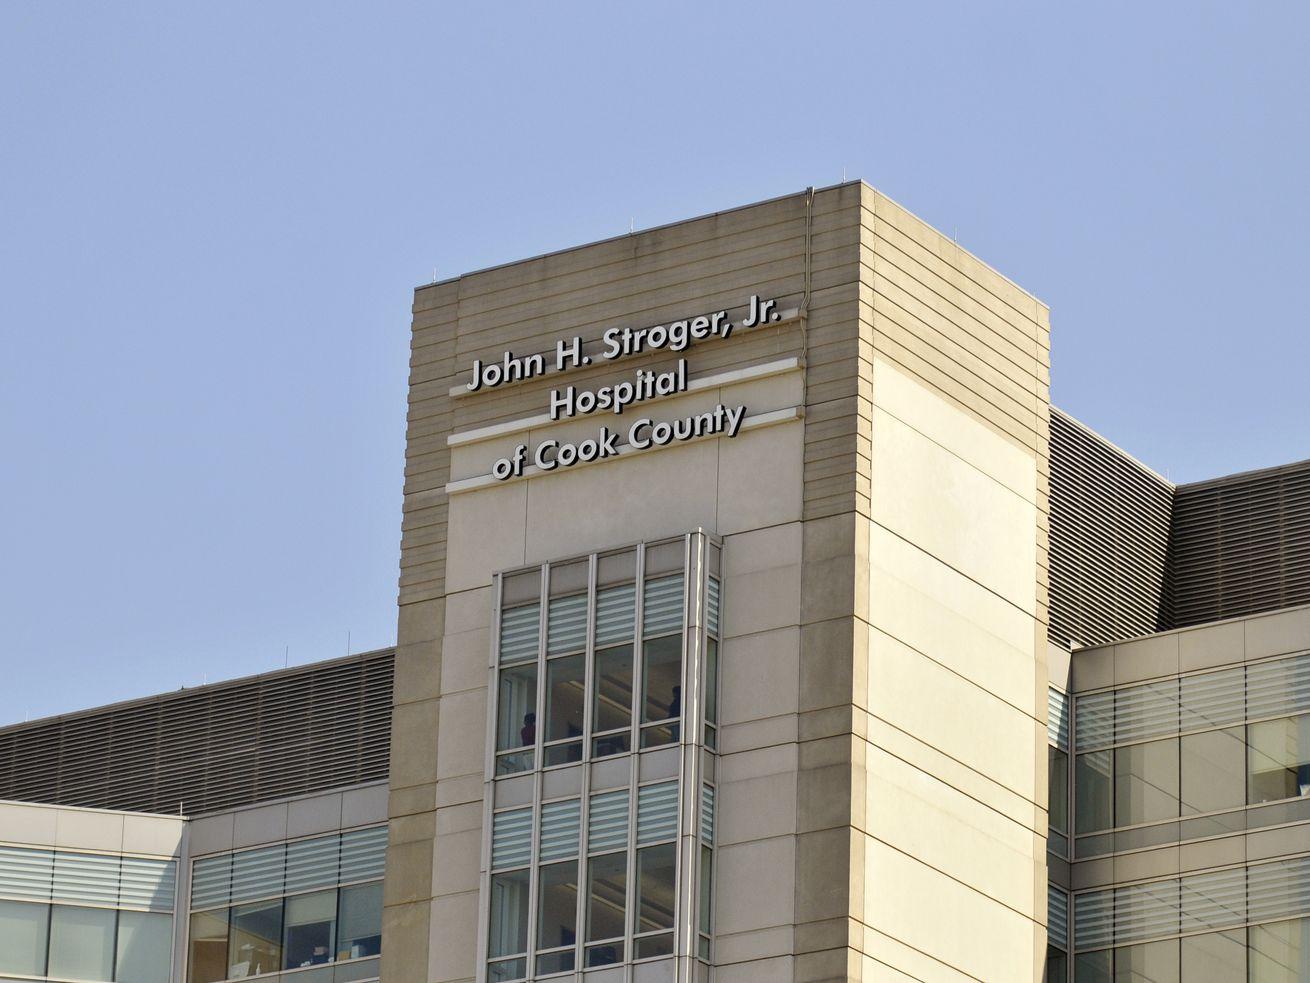 Stroger Hospital nurse worked under the influence, took equipment, inspector general finds